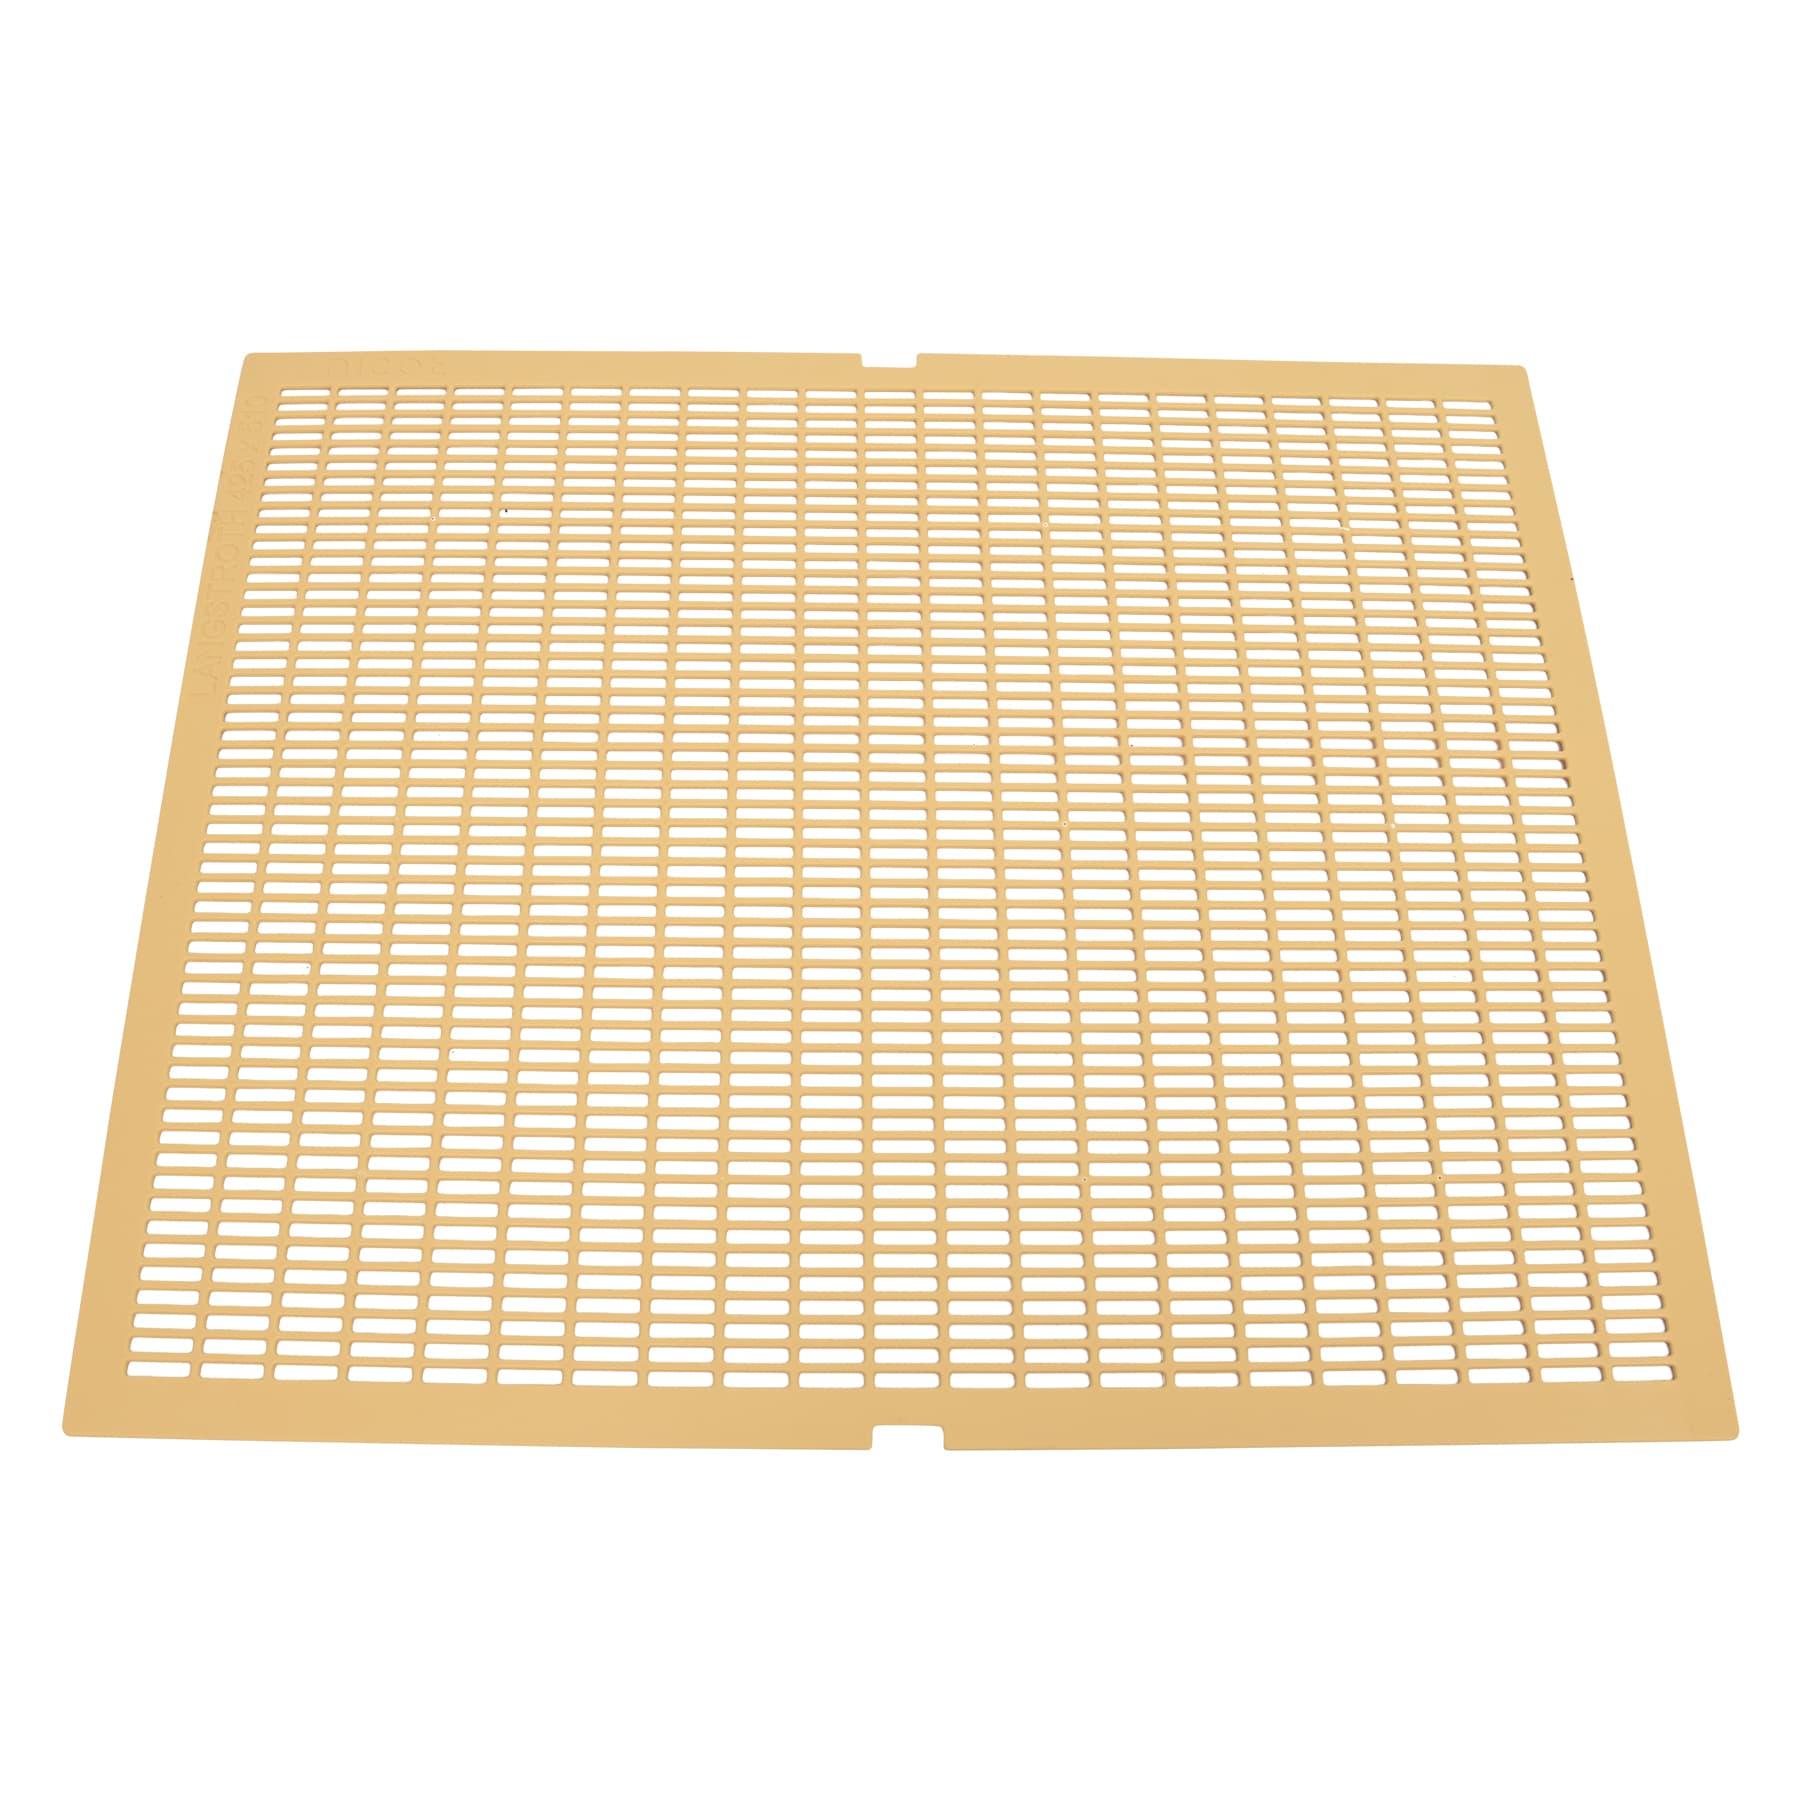 Absperrgitter Kunststoff, 425 x 510,  Langstroth 10 Waben,  gelb,  Nicot